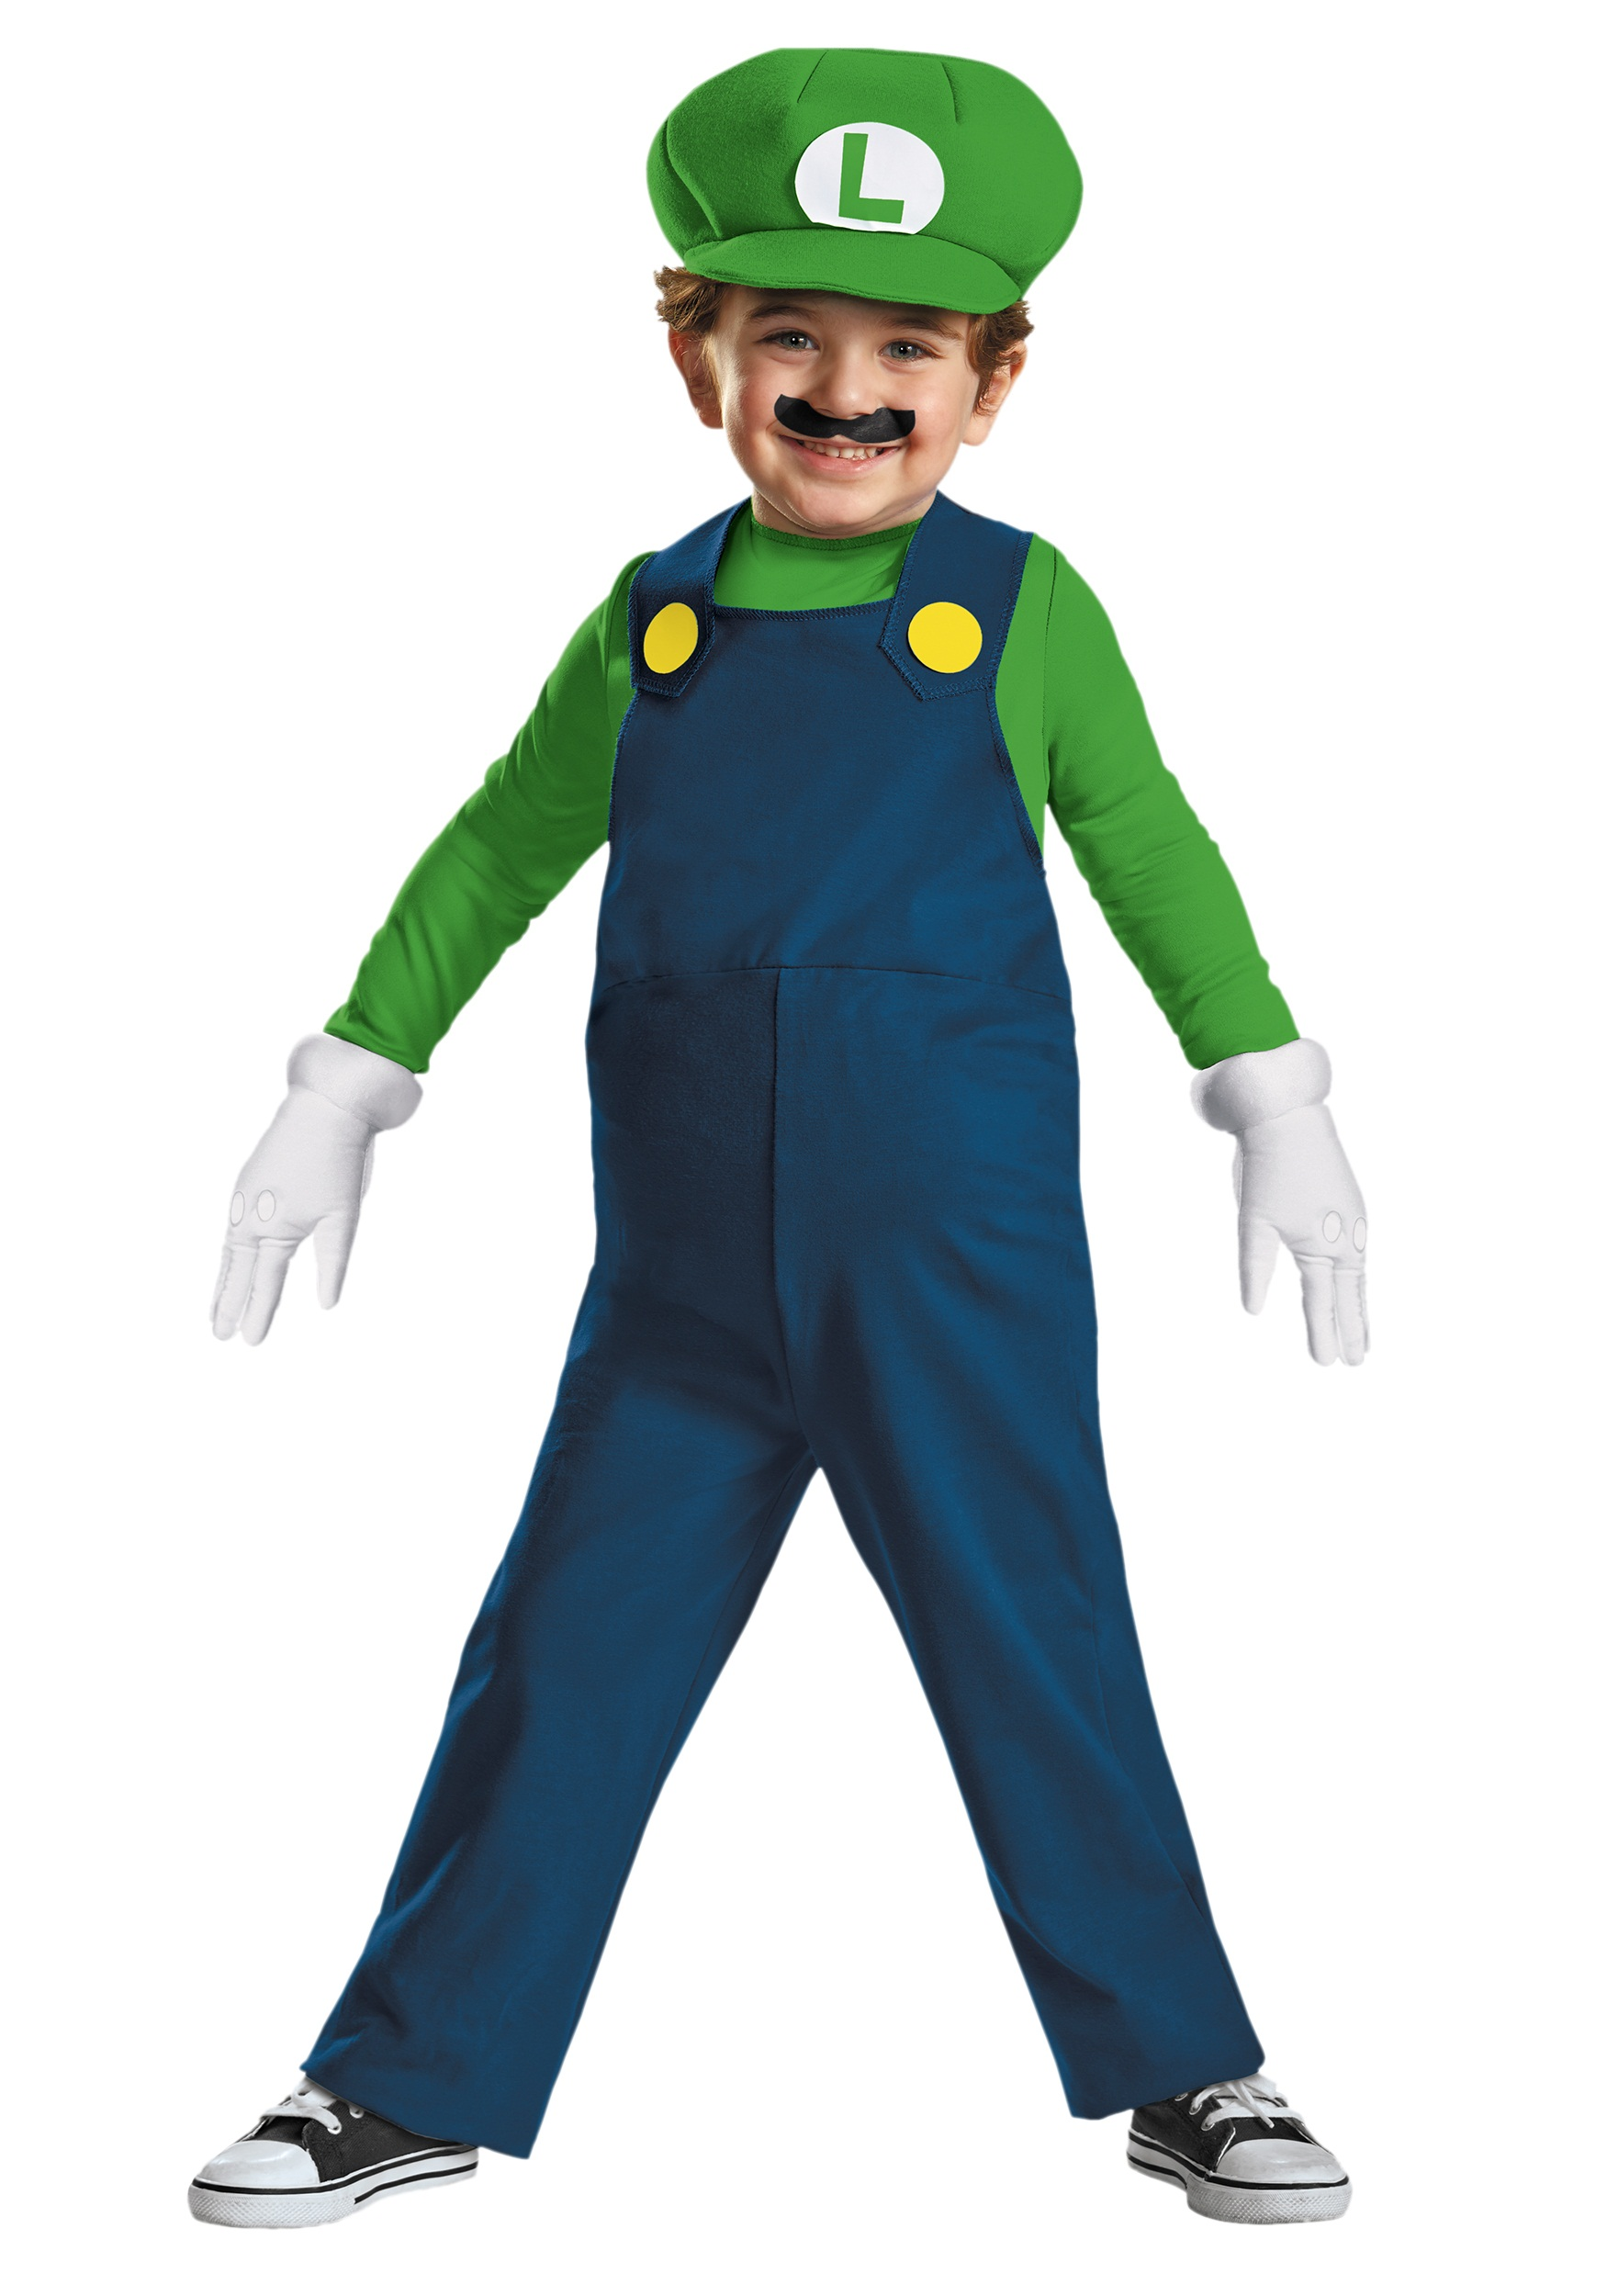 Mario And Luigi Halloween Costumes - HalloweenCostumes